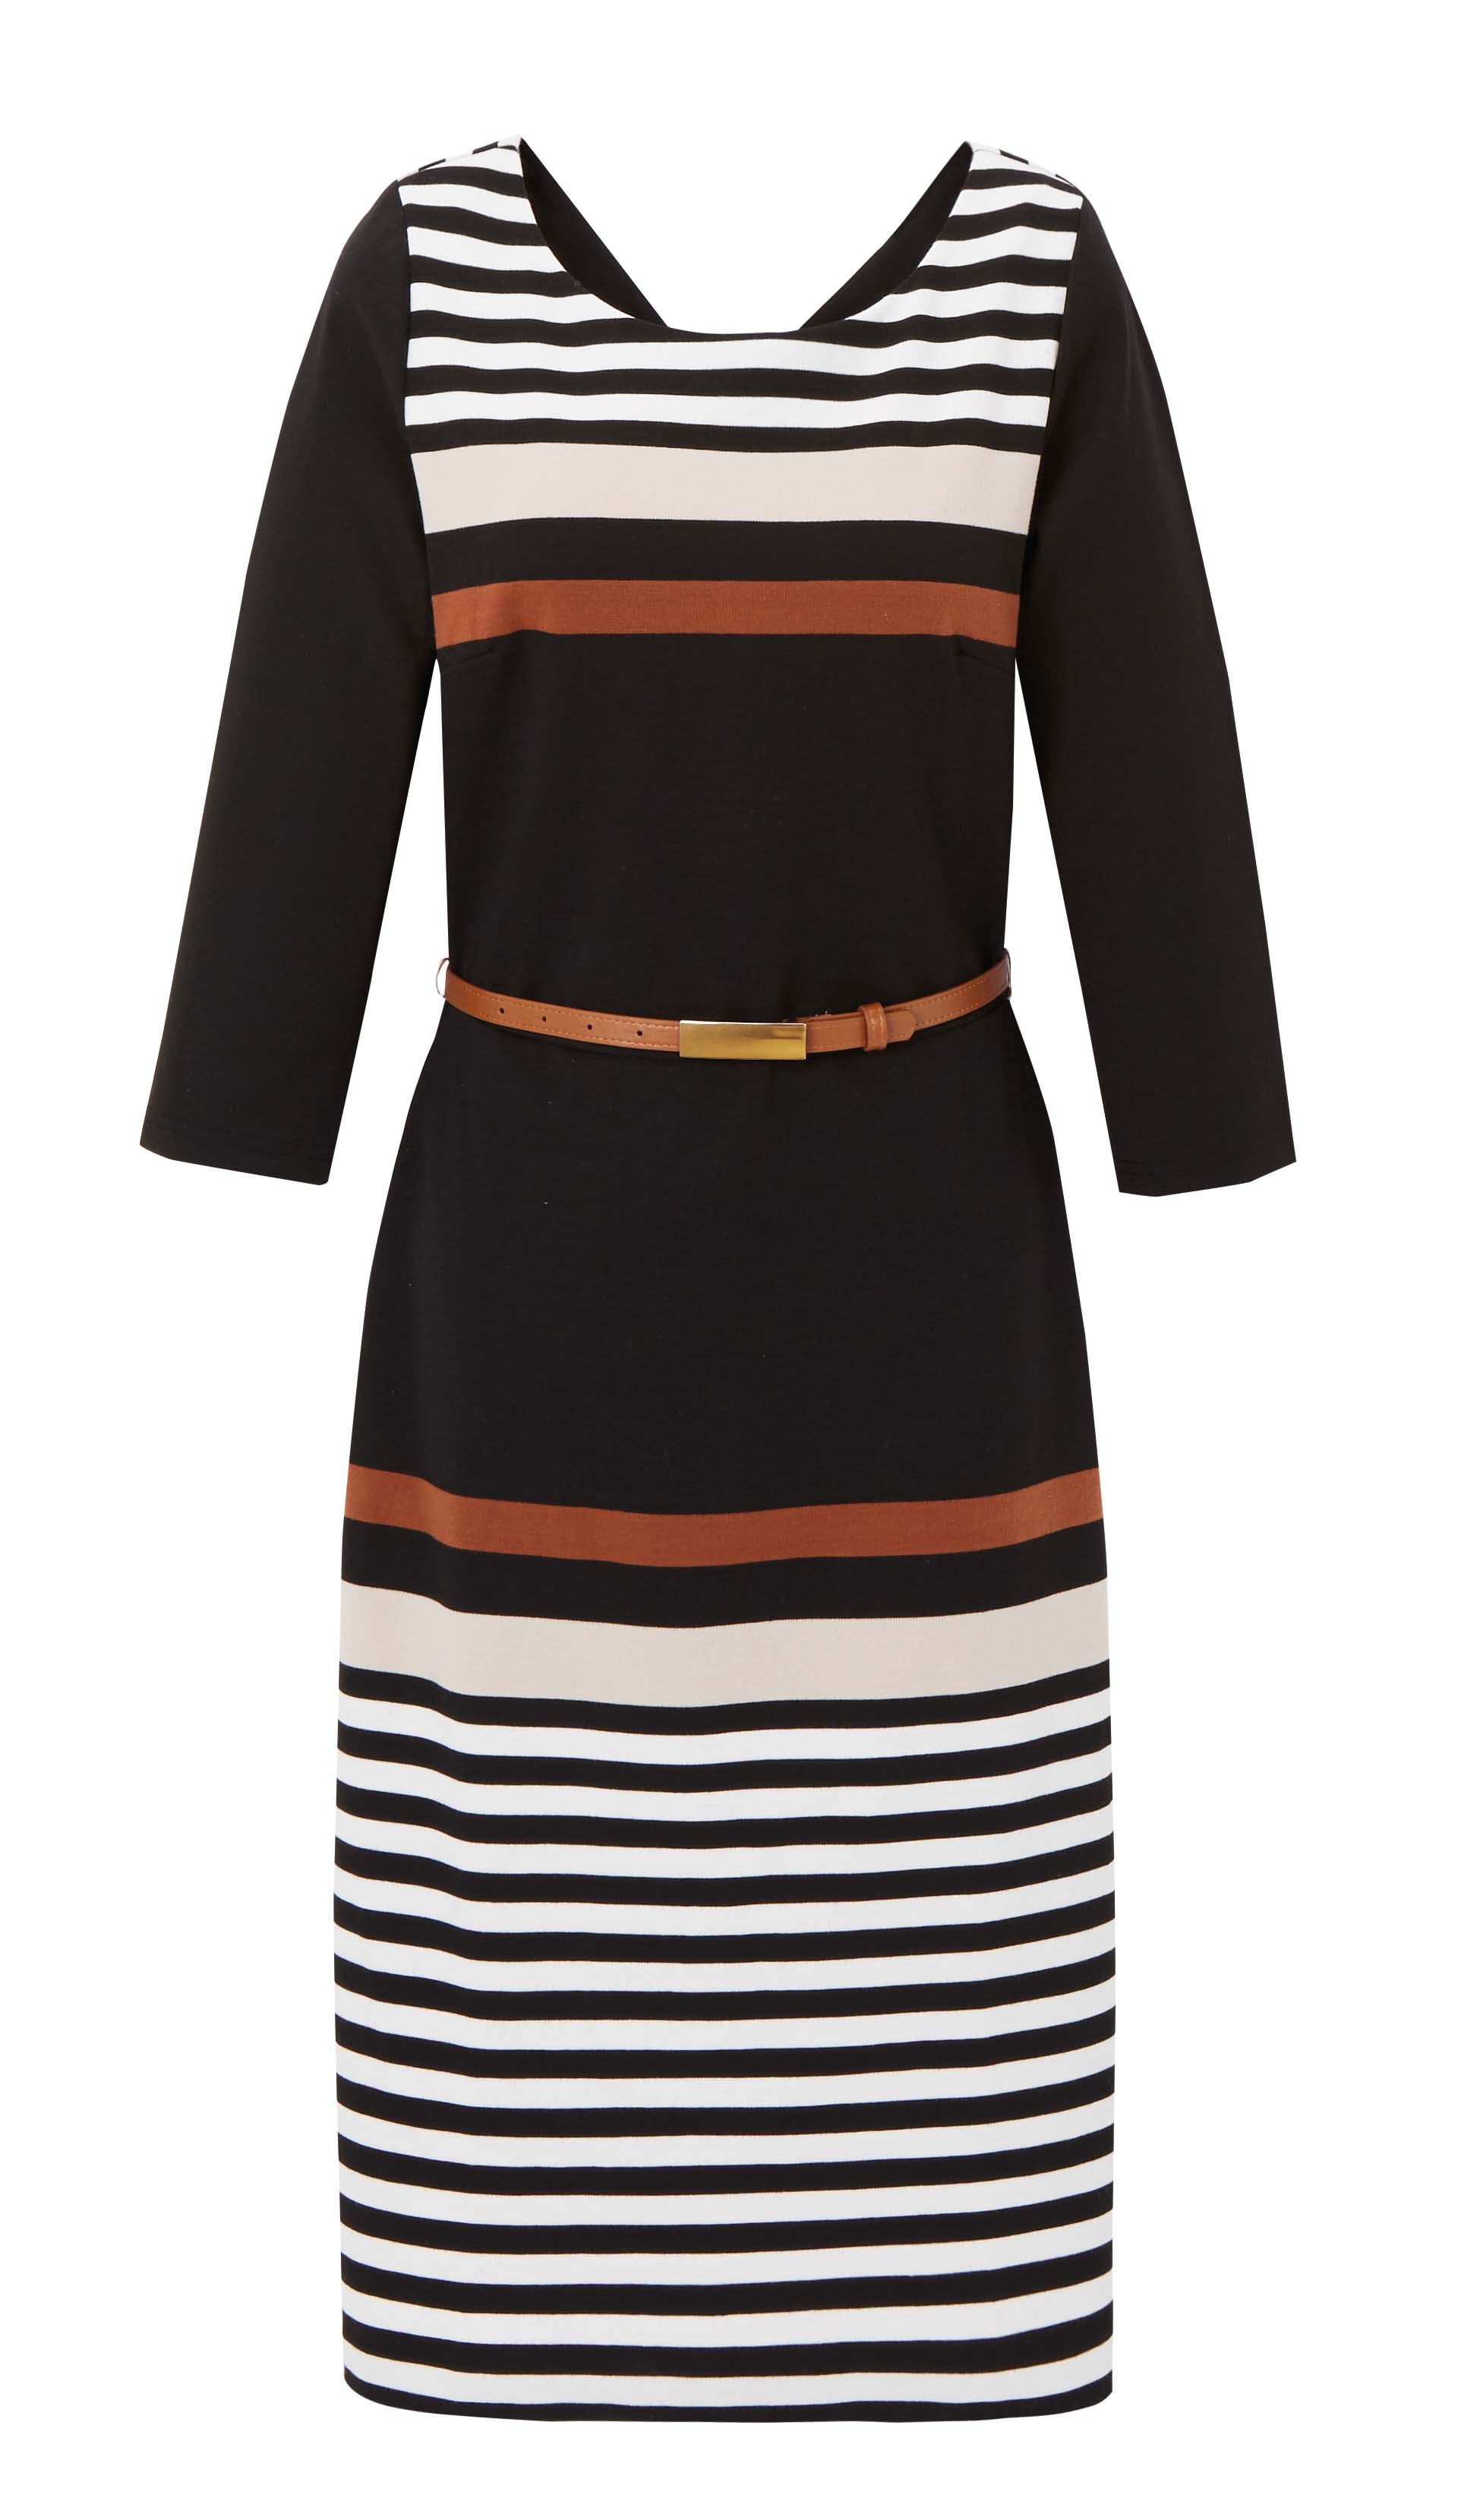 6090992 Whistle Stripe Ponte Dress with Stripe Neutral Stripe $89.99 Instore 8 Mar 2016